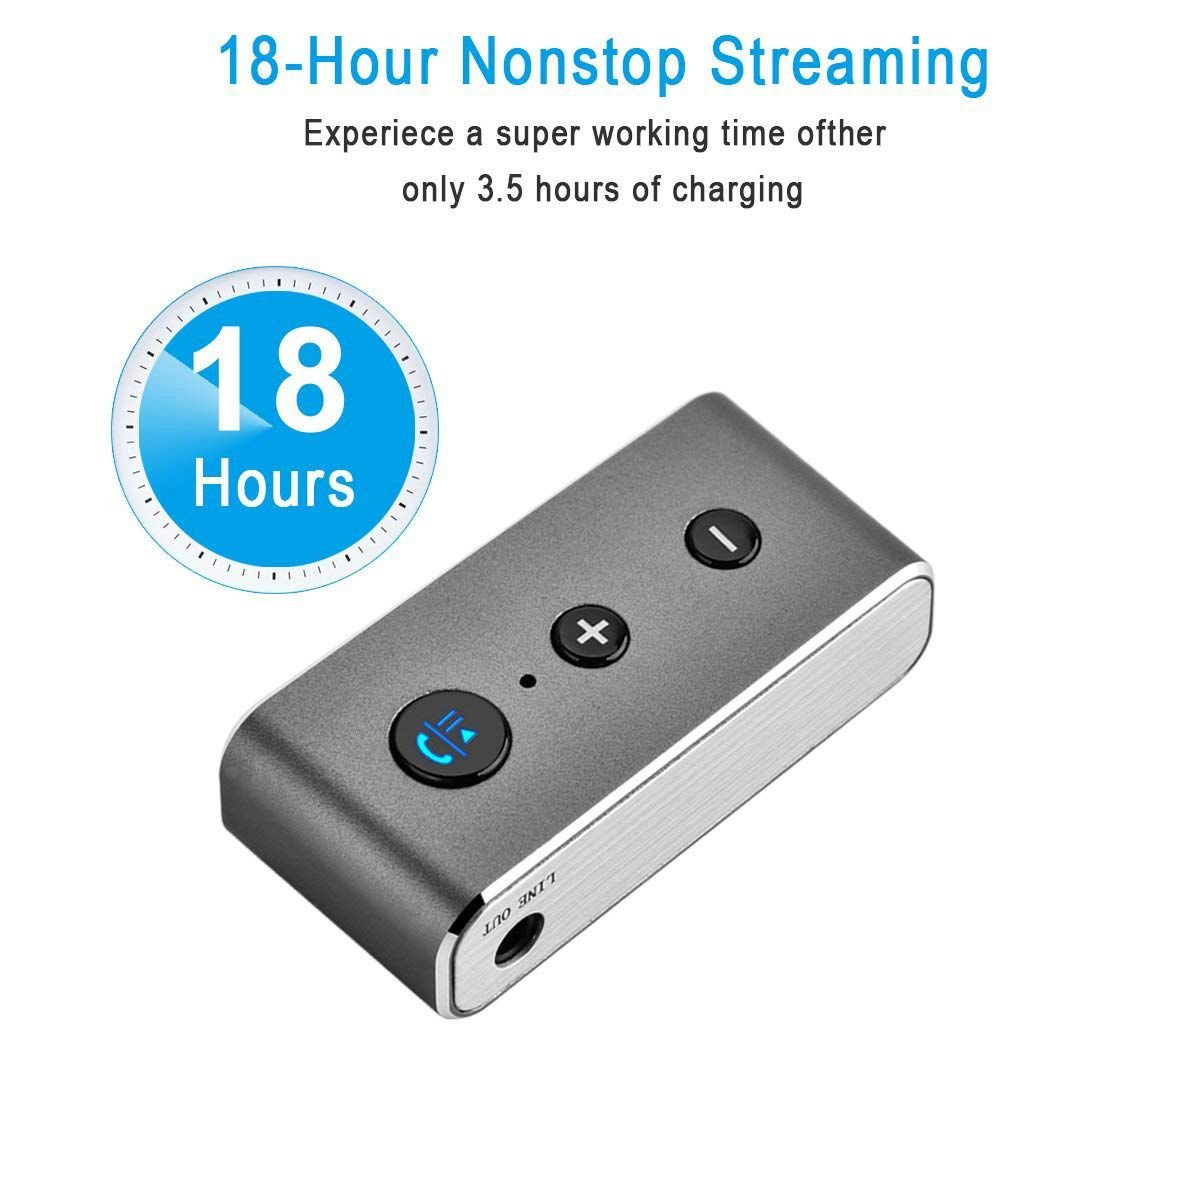 BT710 3.5mm Aux USB Wireless Bluetooth Audio Music Reciever TF Card Slot 2.4GHz